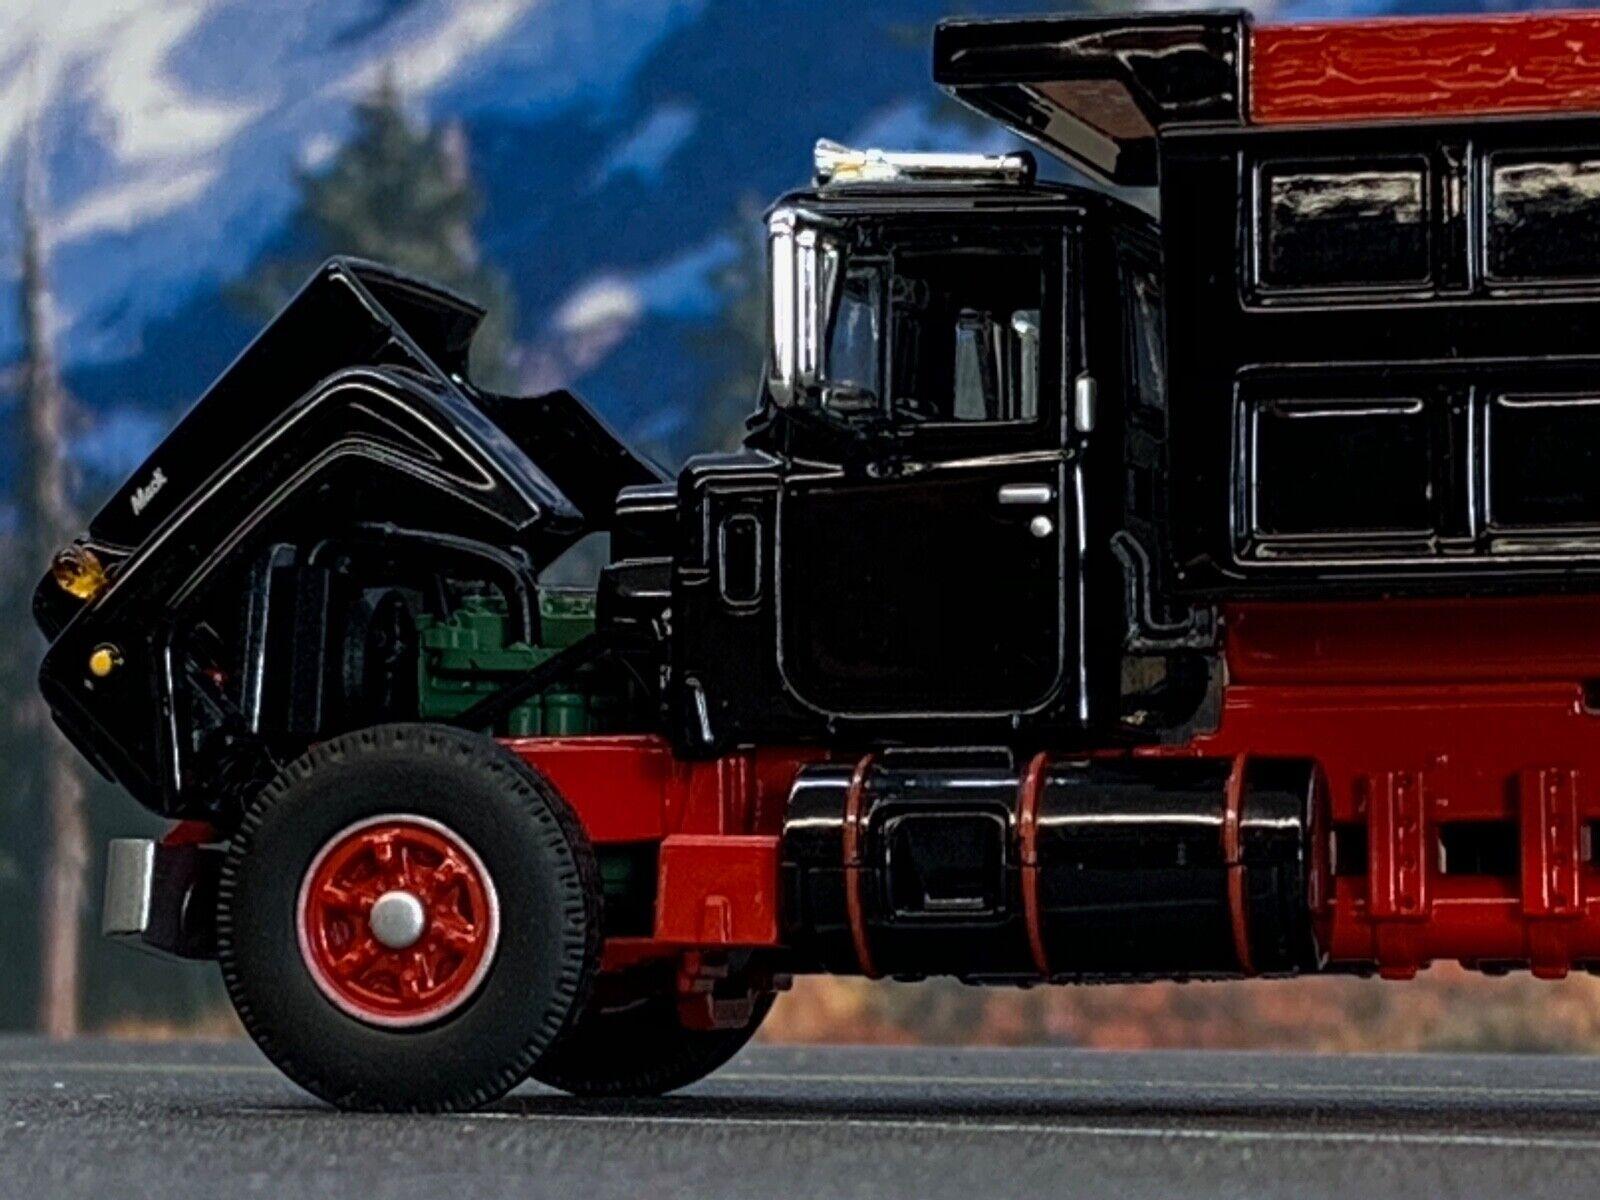 1/64 DCP FIRST GEAR BLACK/RED MACK R DUMP TRUCK 3